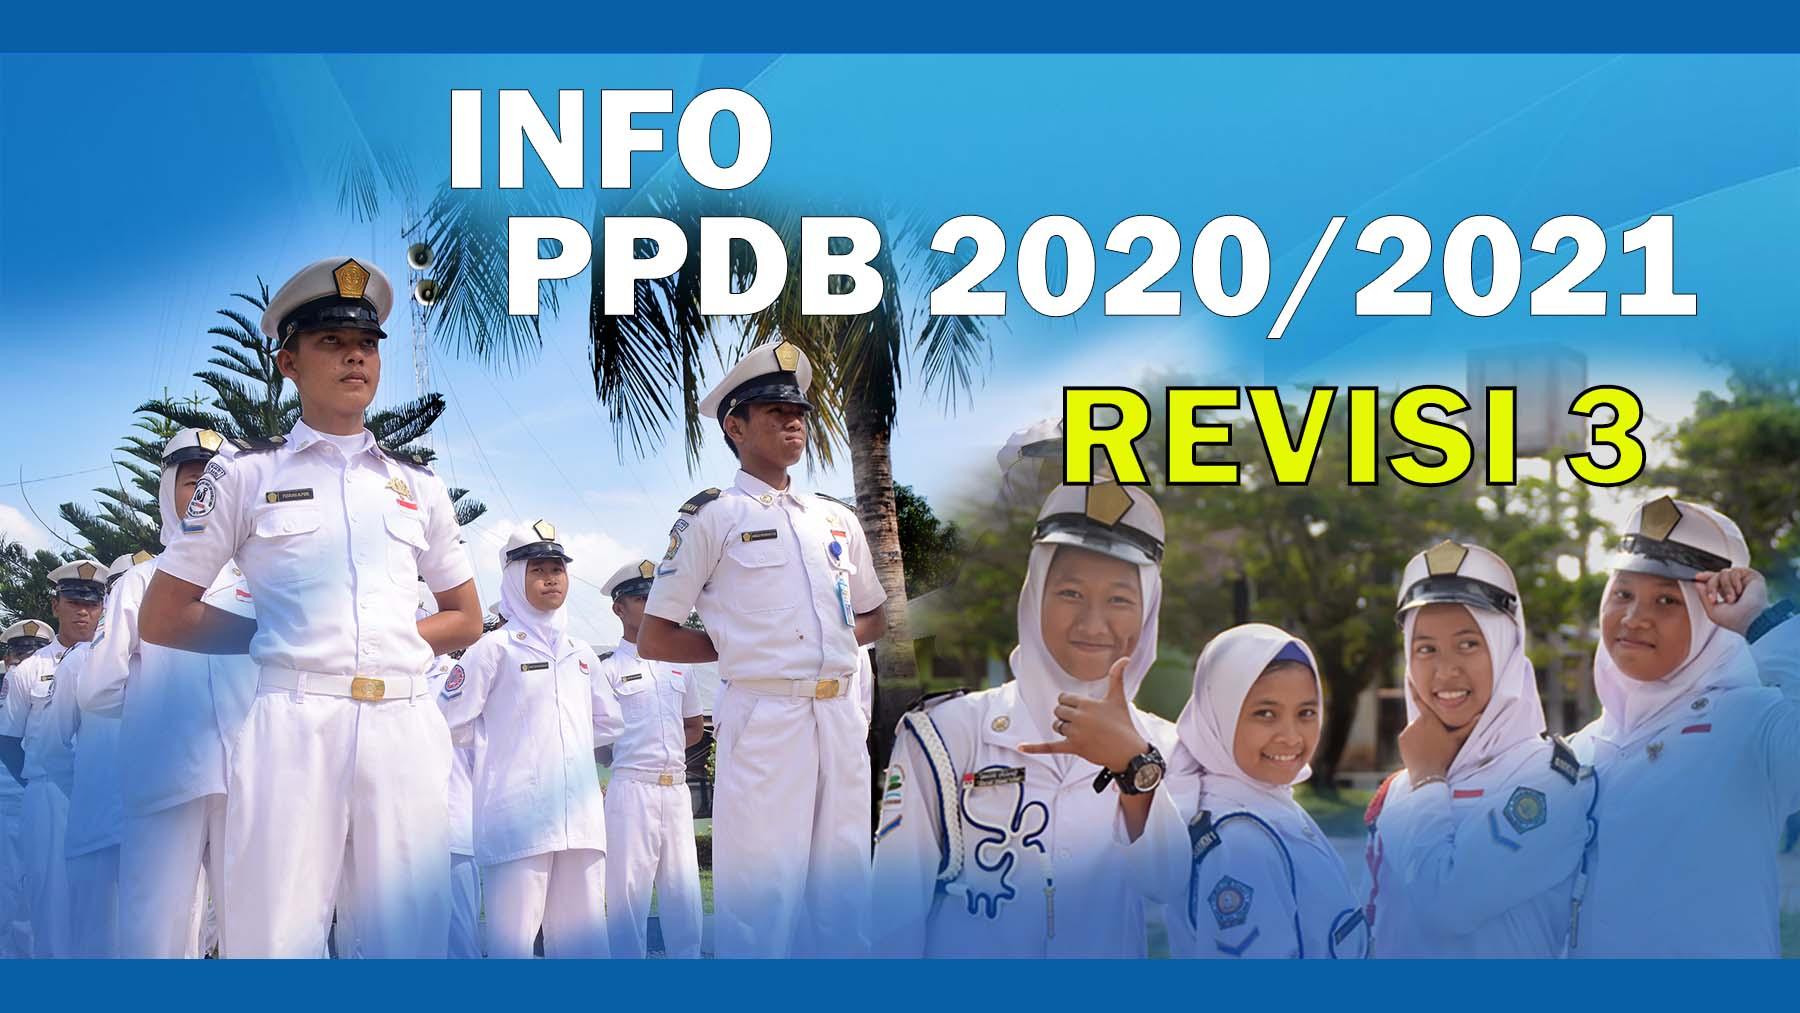 PPDB 2020/2021 Edisi Revisi 3